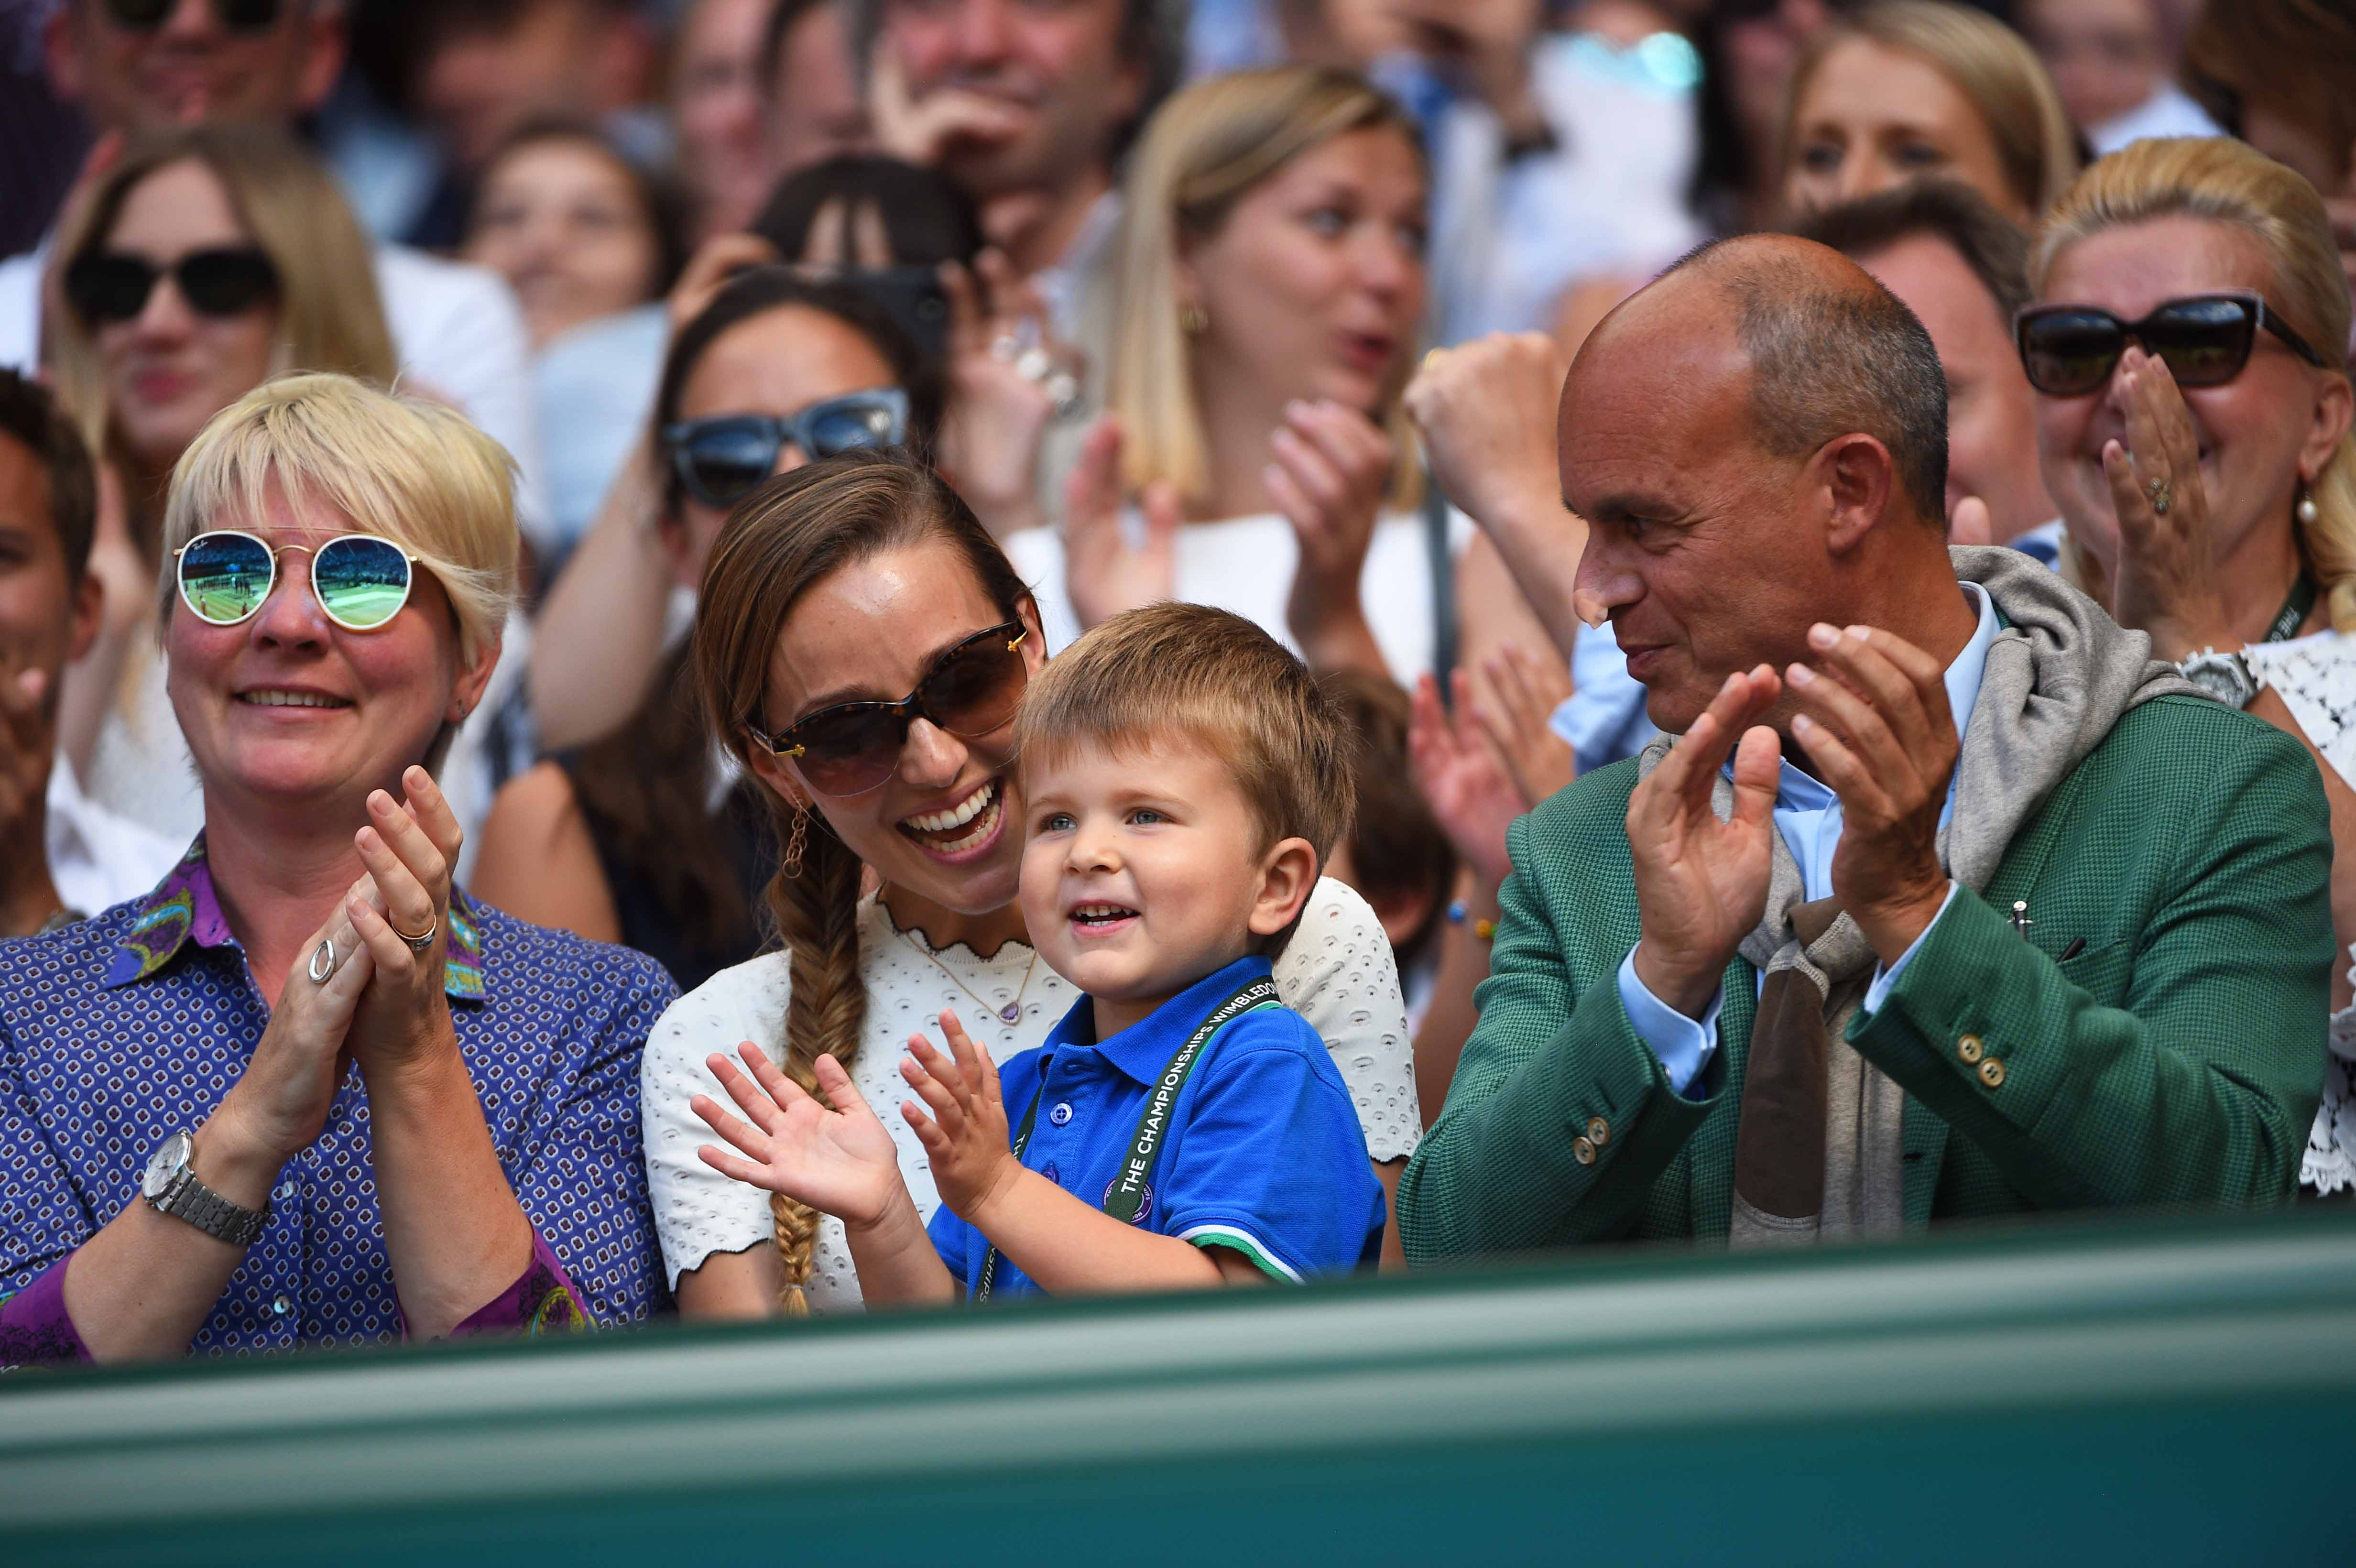 Stefan and Jelena Djokovic Wimbledon 2018.